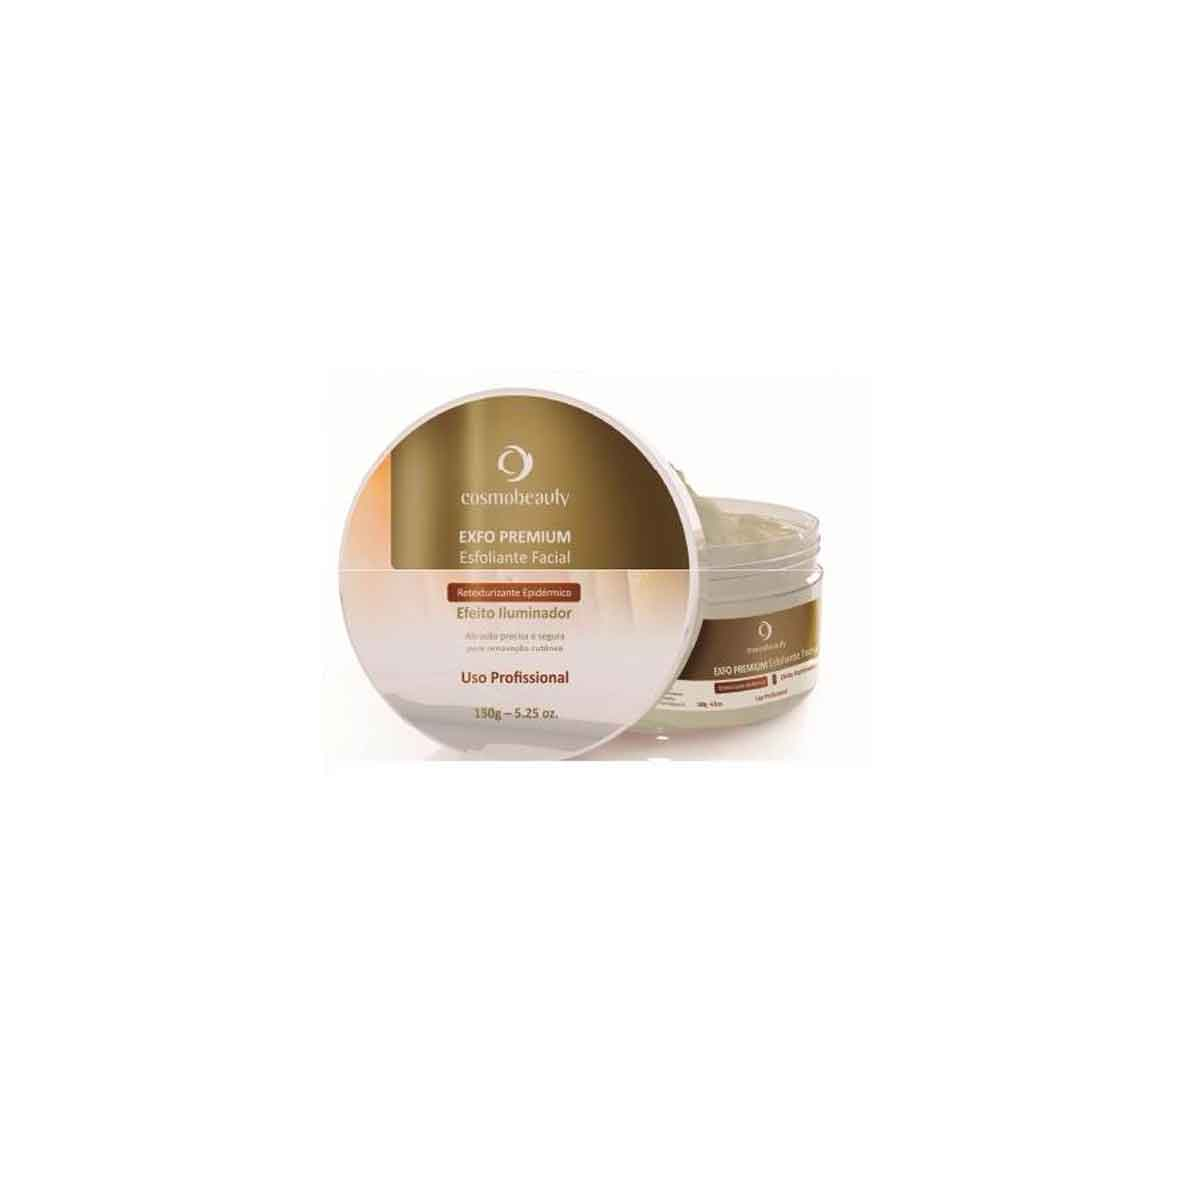 Esfoliante Facial Exfo Premium - 140g